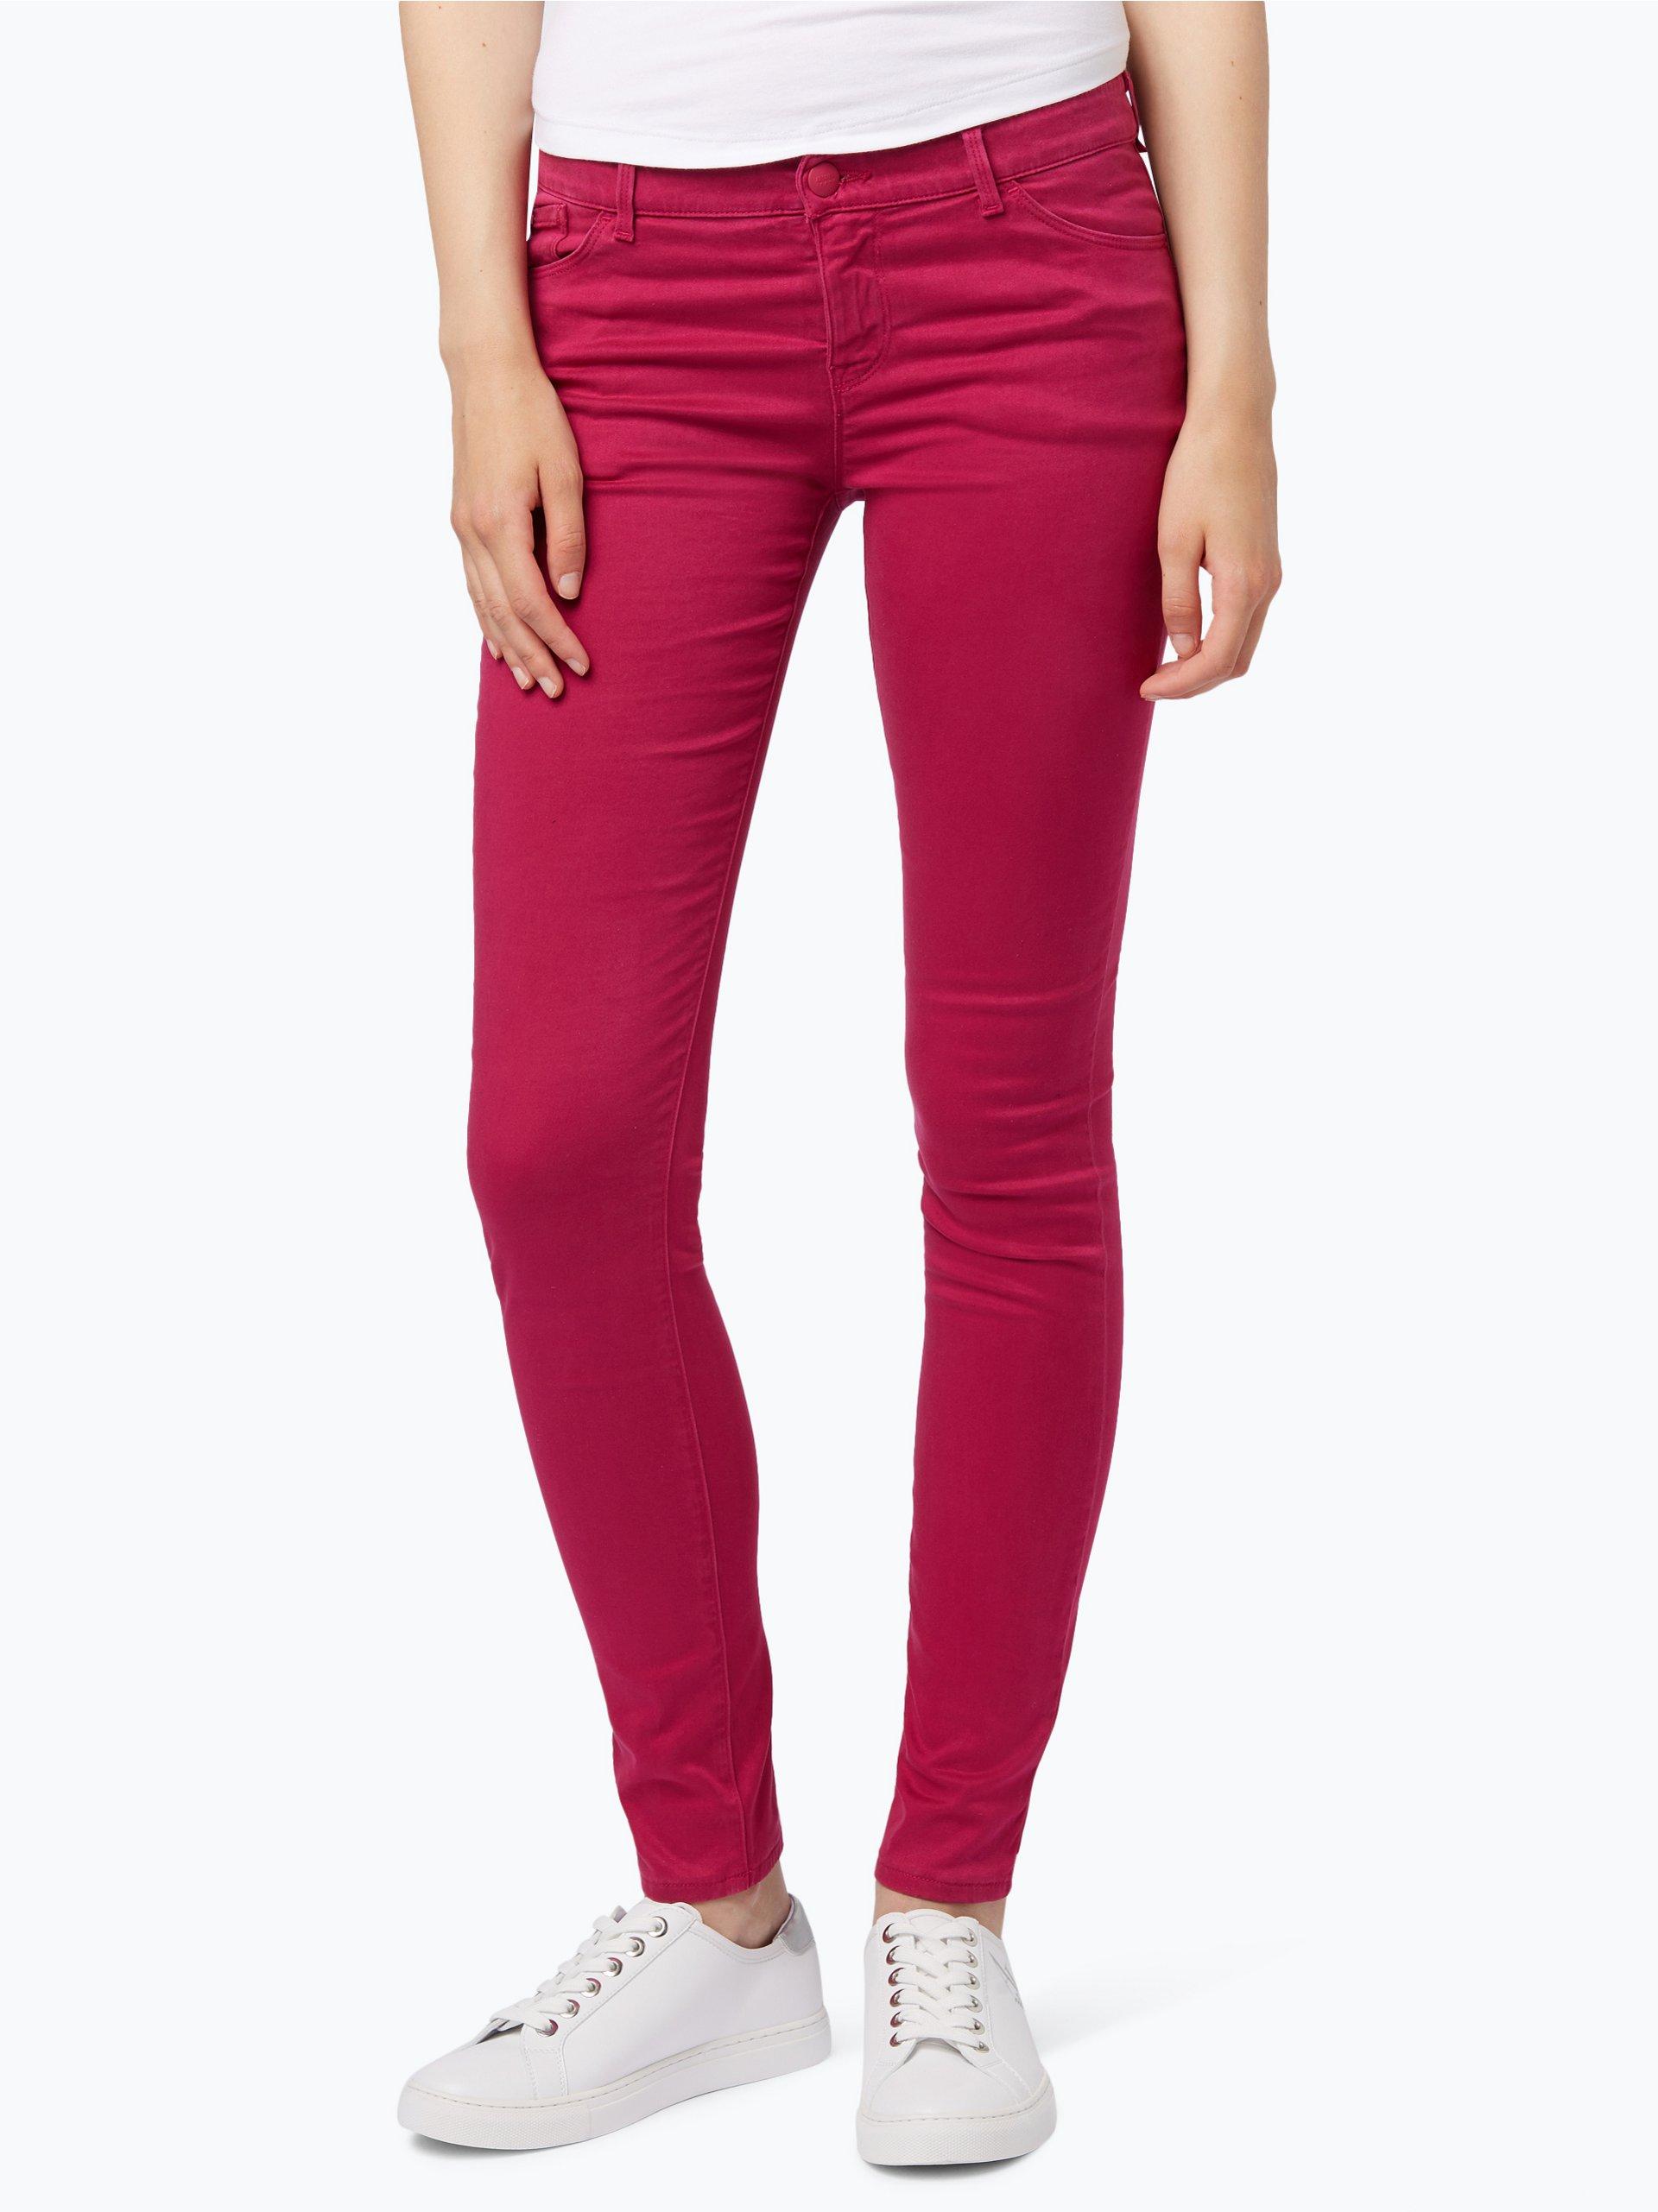 armani jeans damen jeans j23 lily pink uni online kaufen. Black Bedroom Furniture Sets. Home Design Ideas